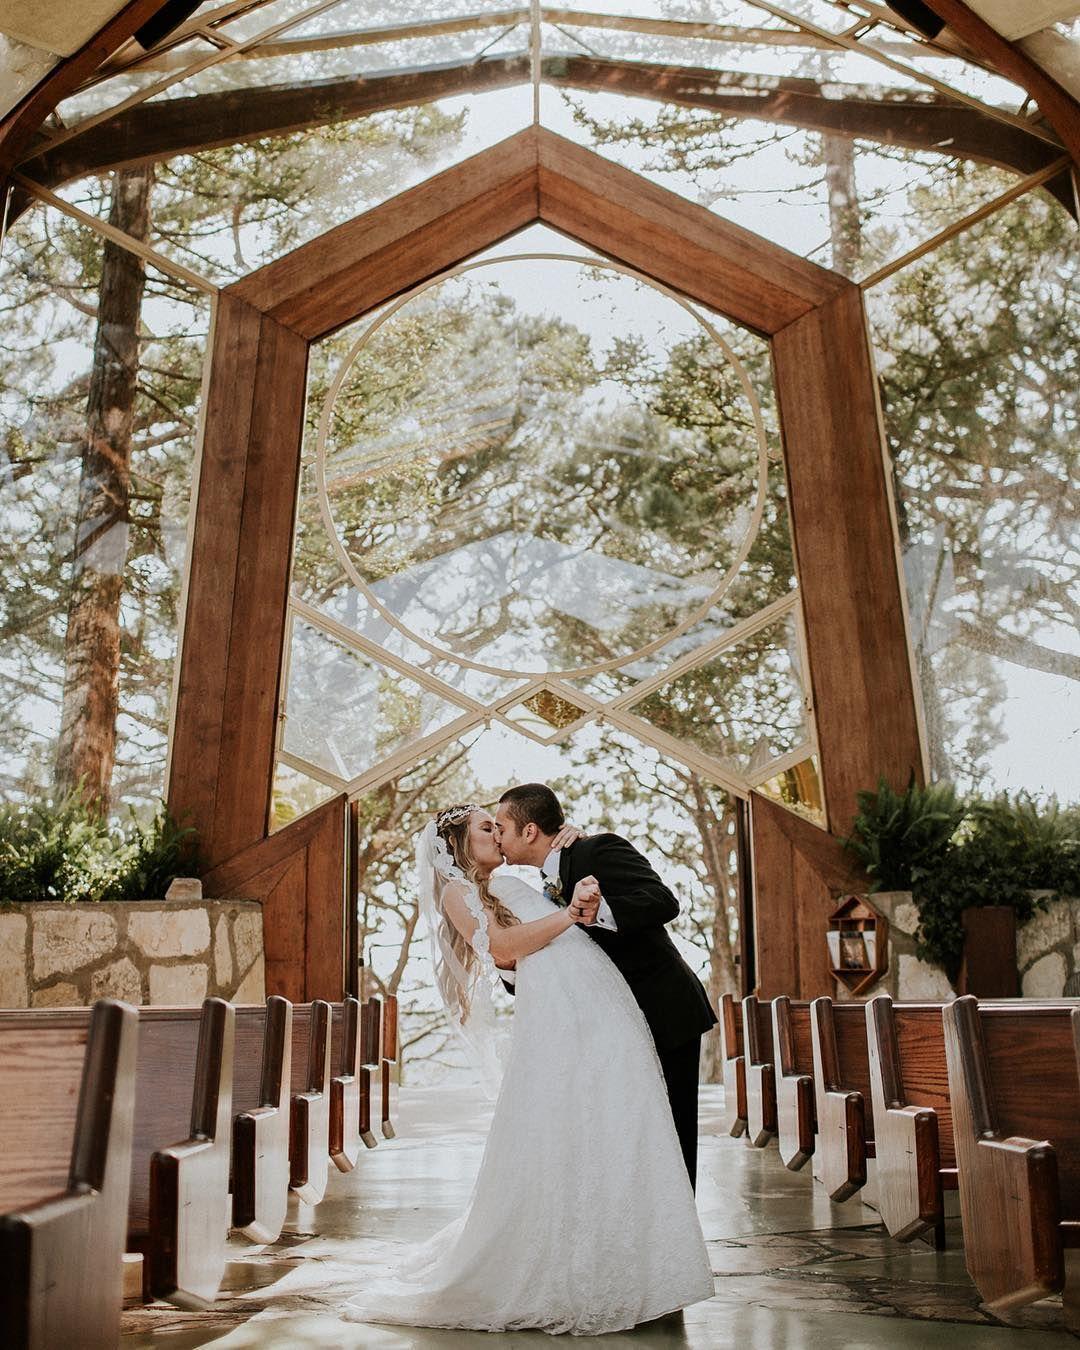 Wayfarers Chapel Best Beach Wedding Locations Los Angeles Area Small Weddi Wedding Locations California California Beach Wedding Wedding Southern California